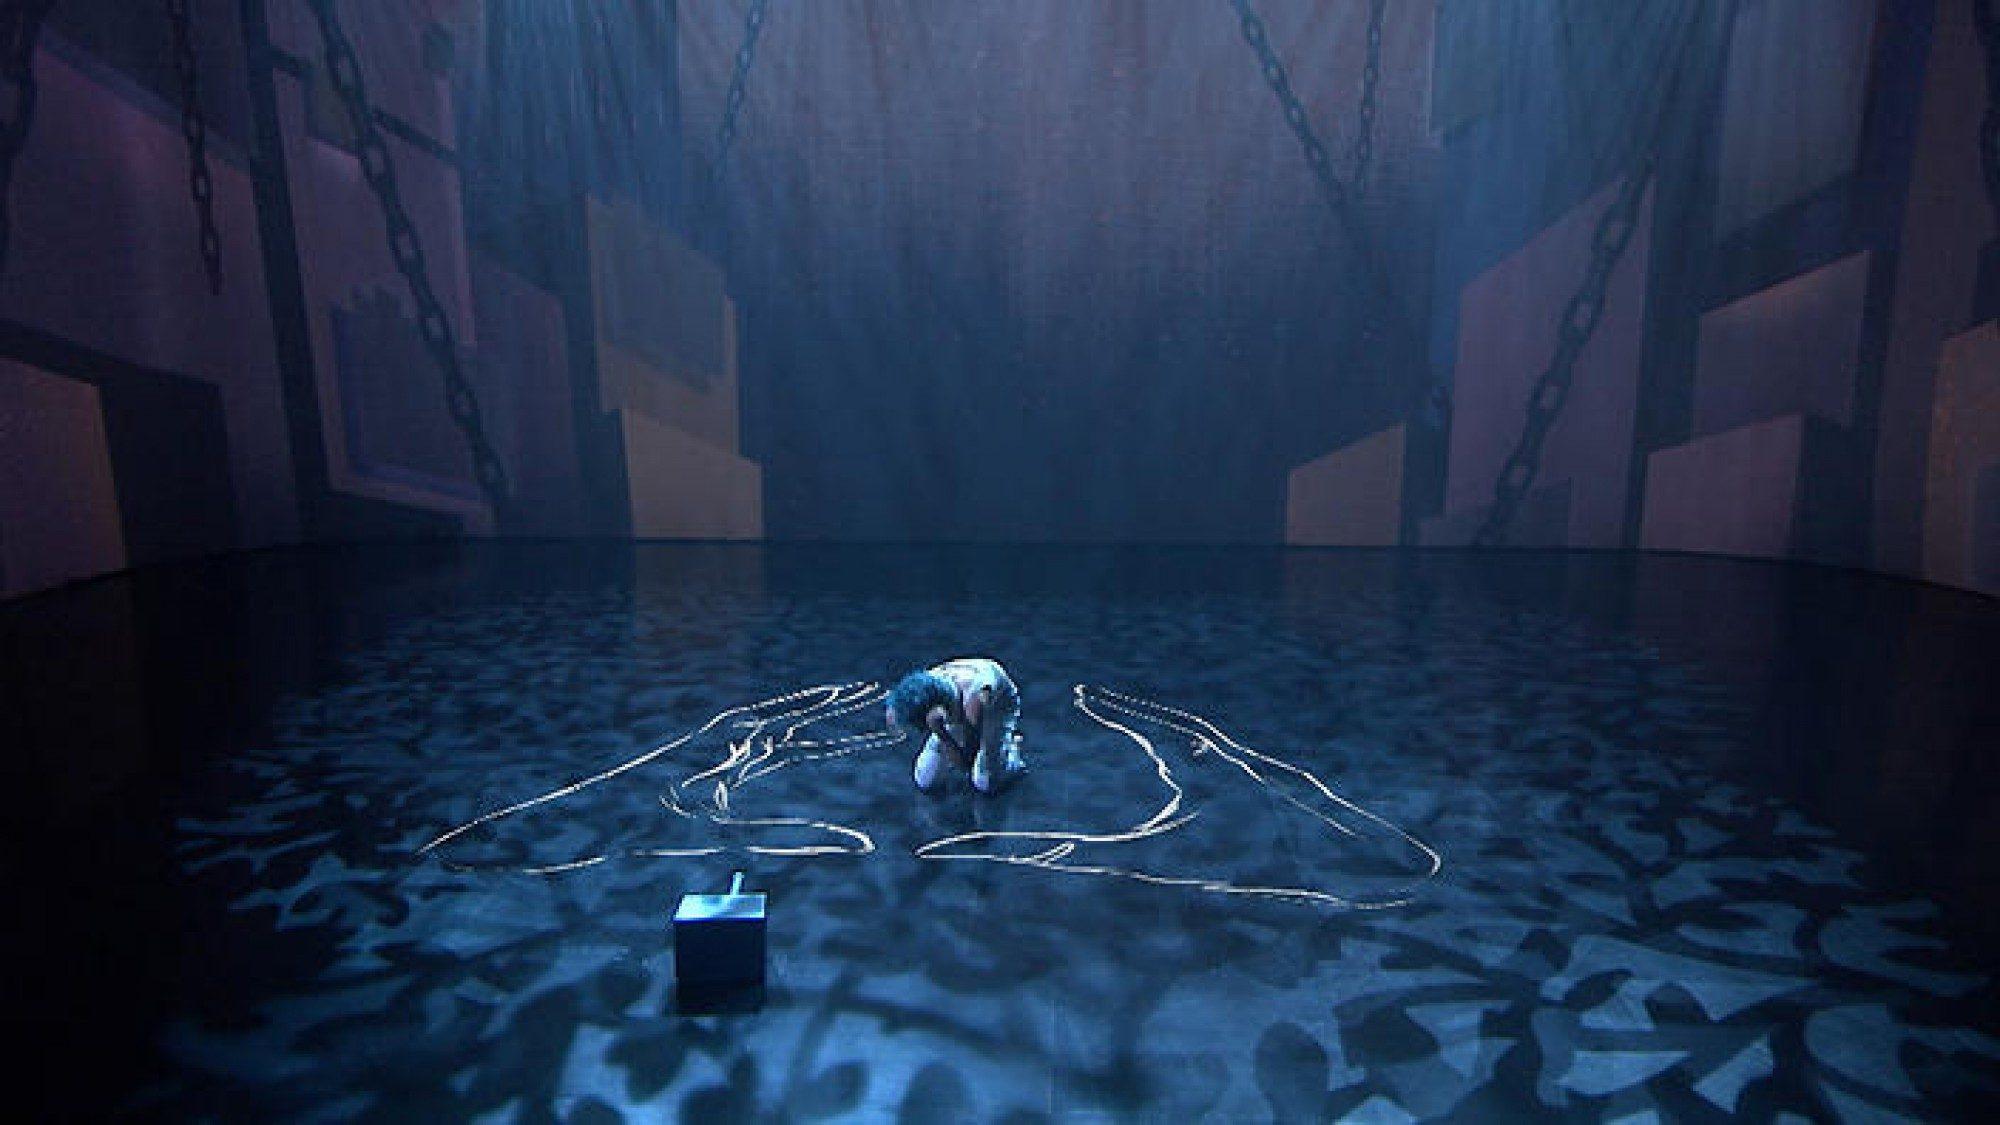 16052020_052050_montaigne-eurovision-2020-big-night-in-performance-1_grande